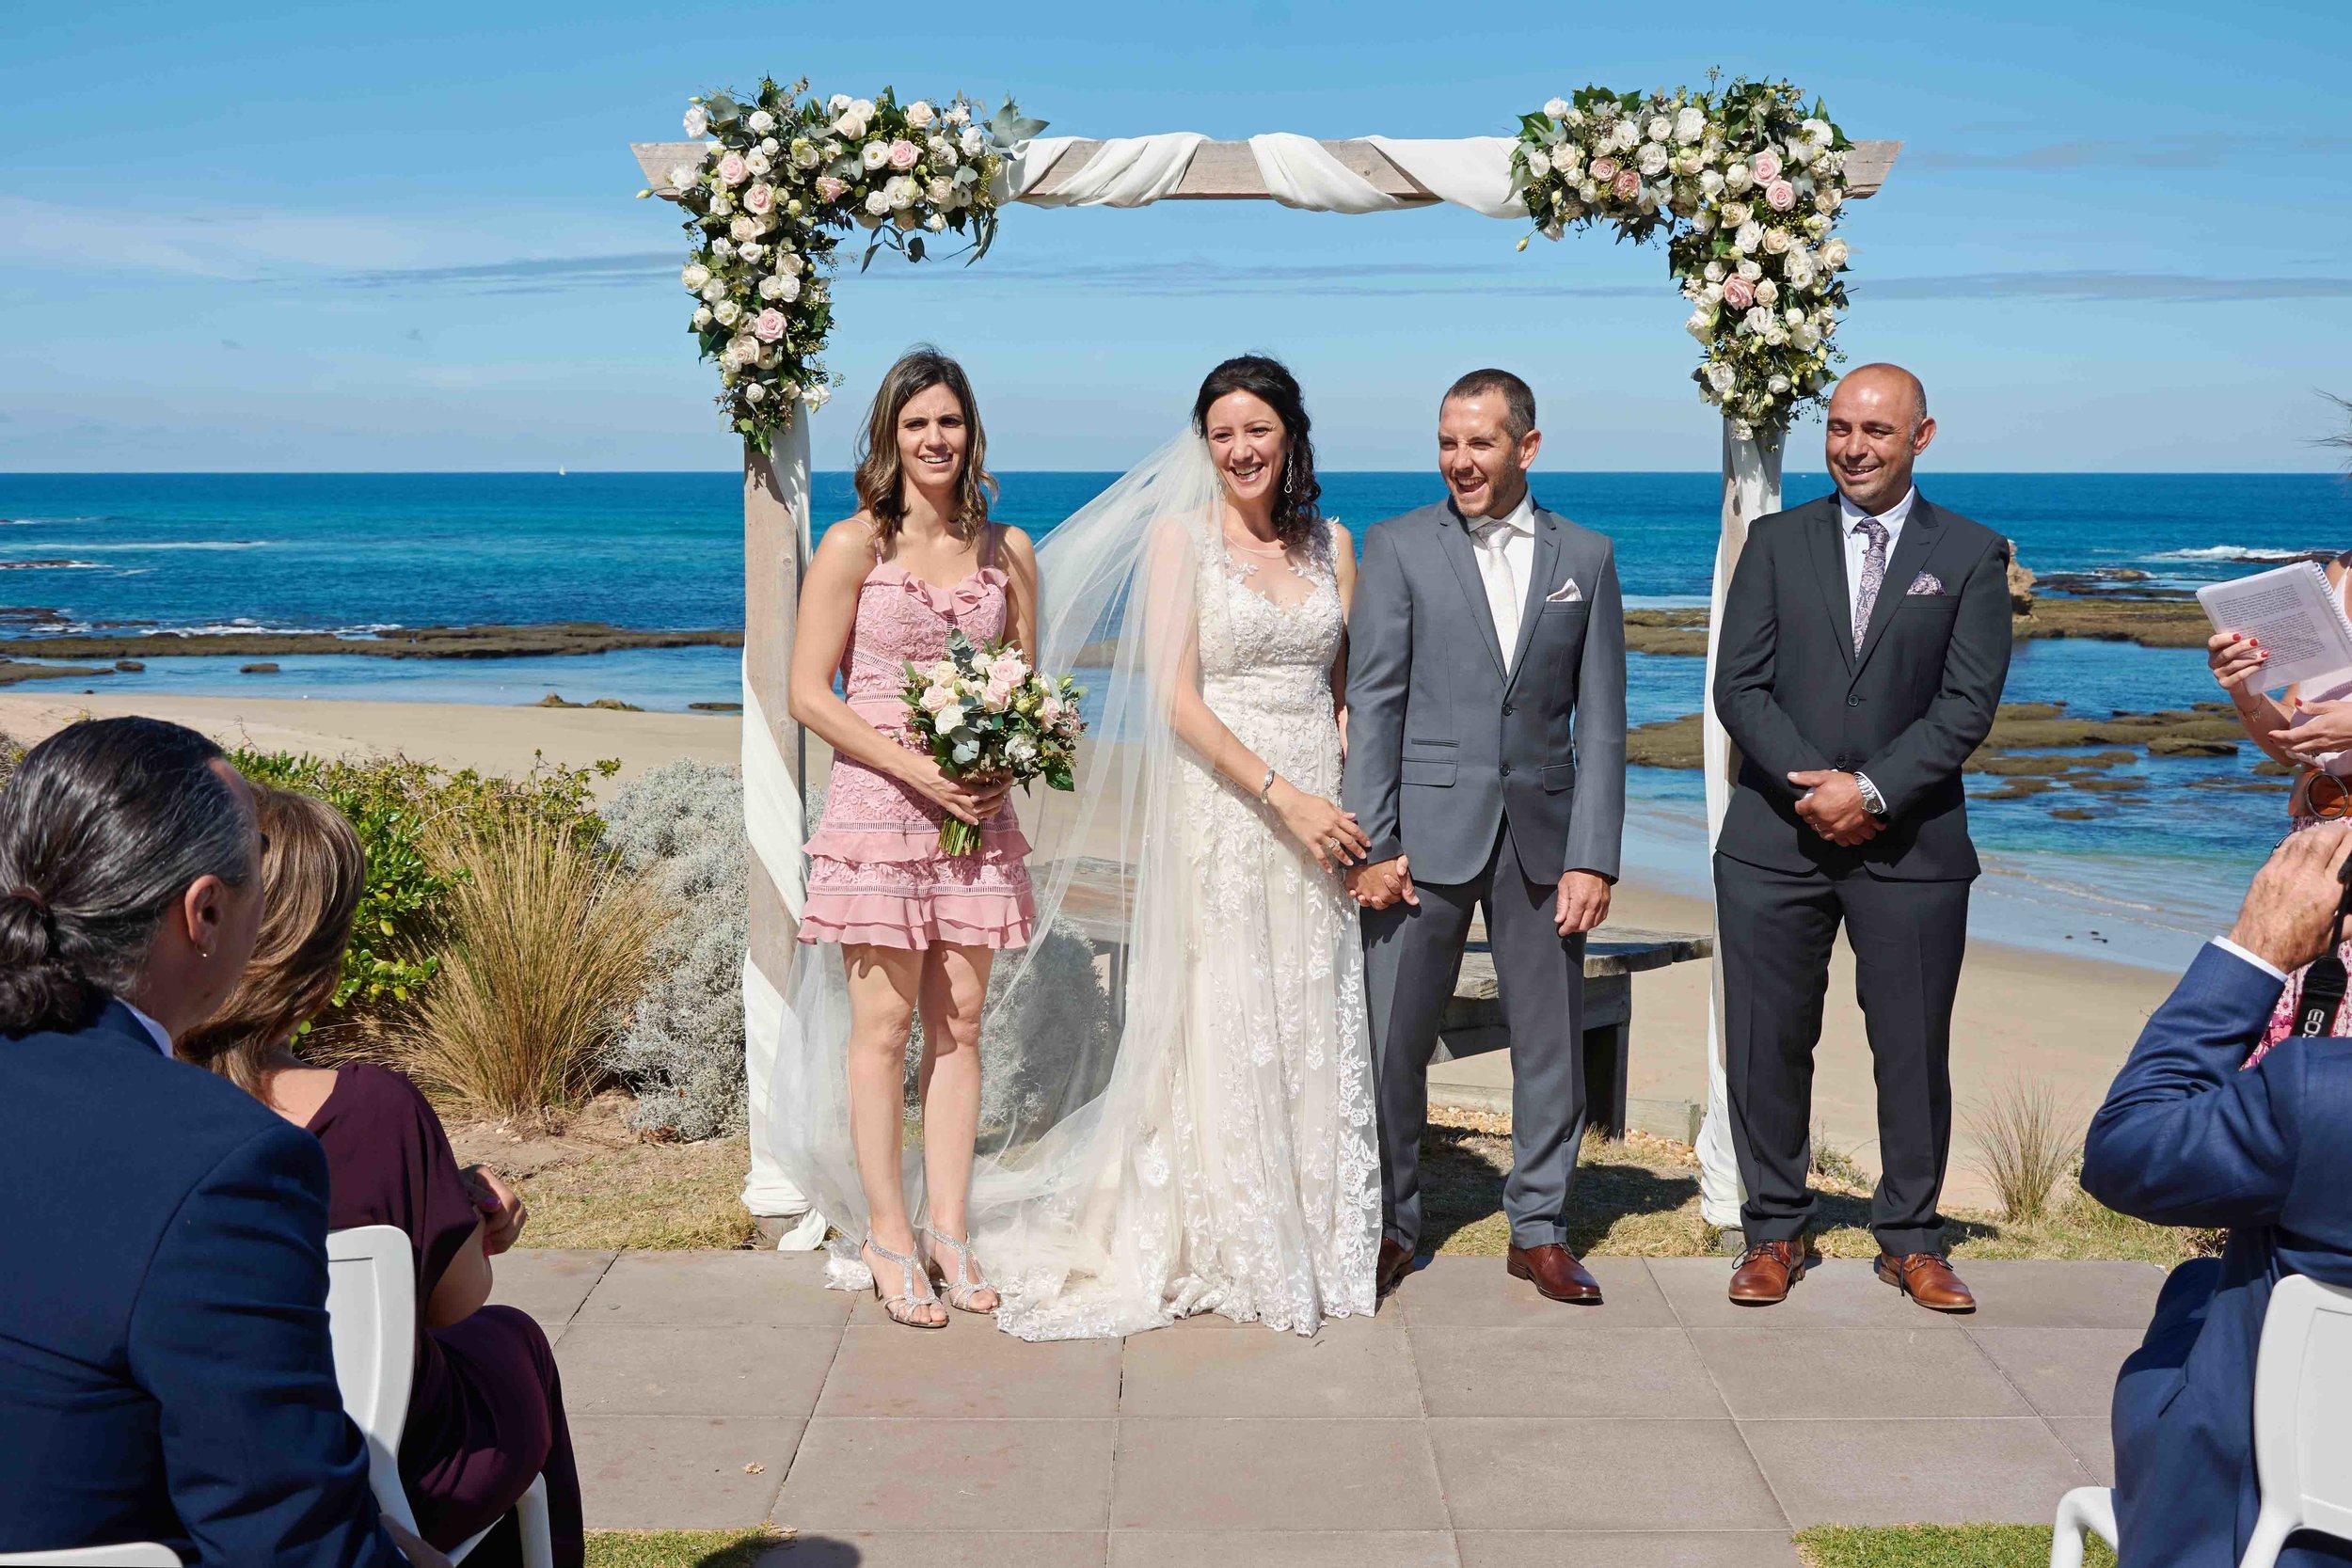 sorrento-wedding-photography-all-smiles-marissa-jade-photography-48.jpg